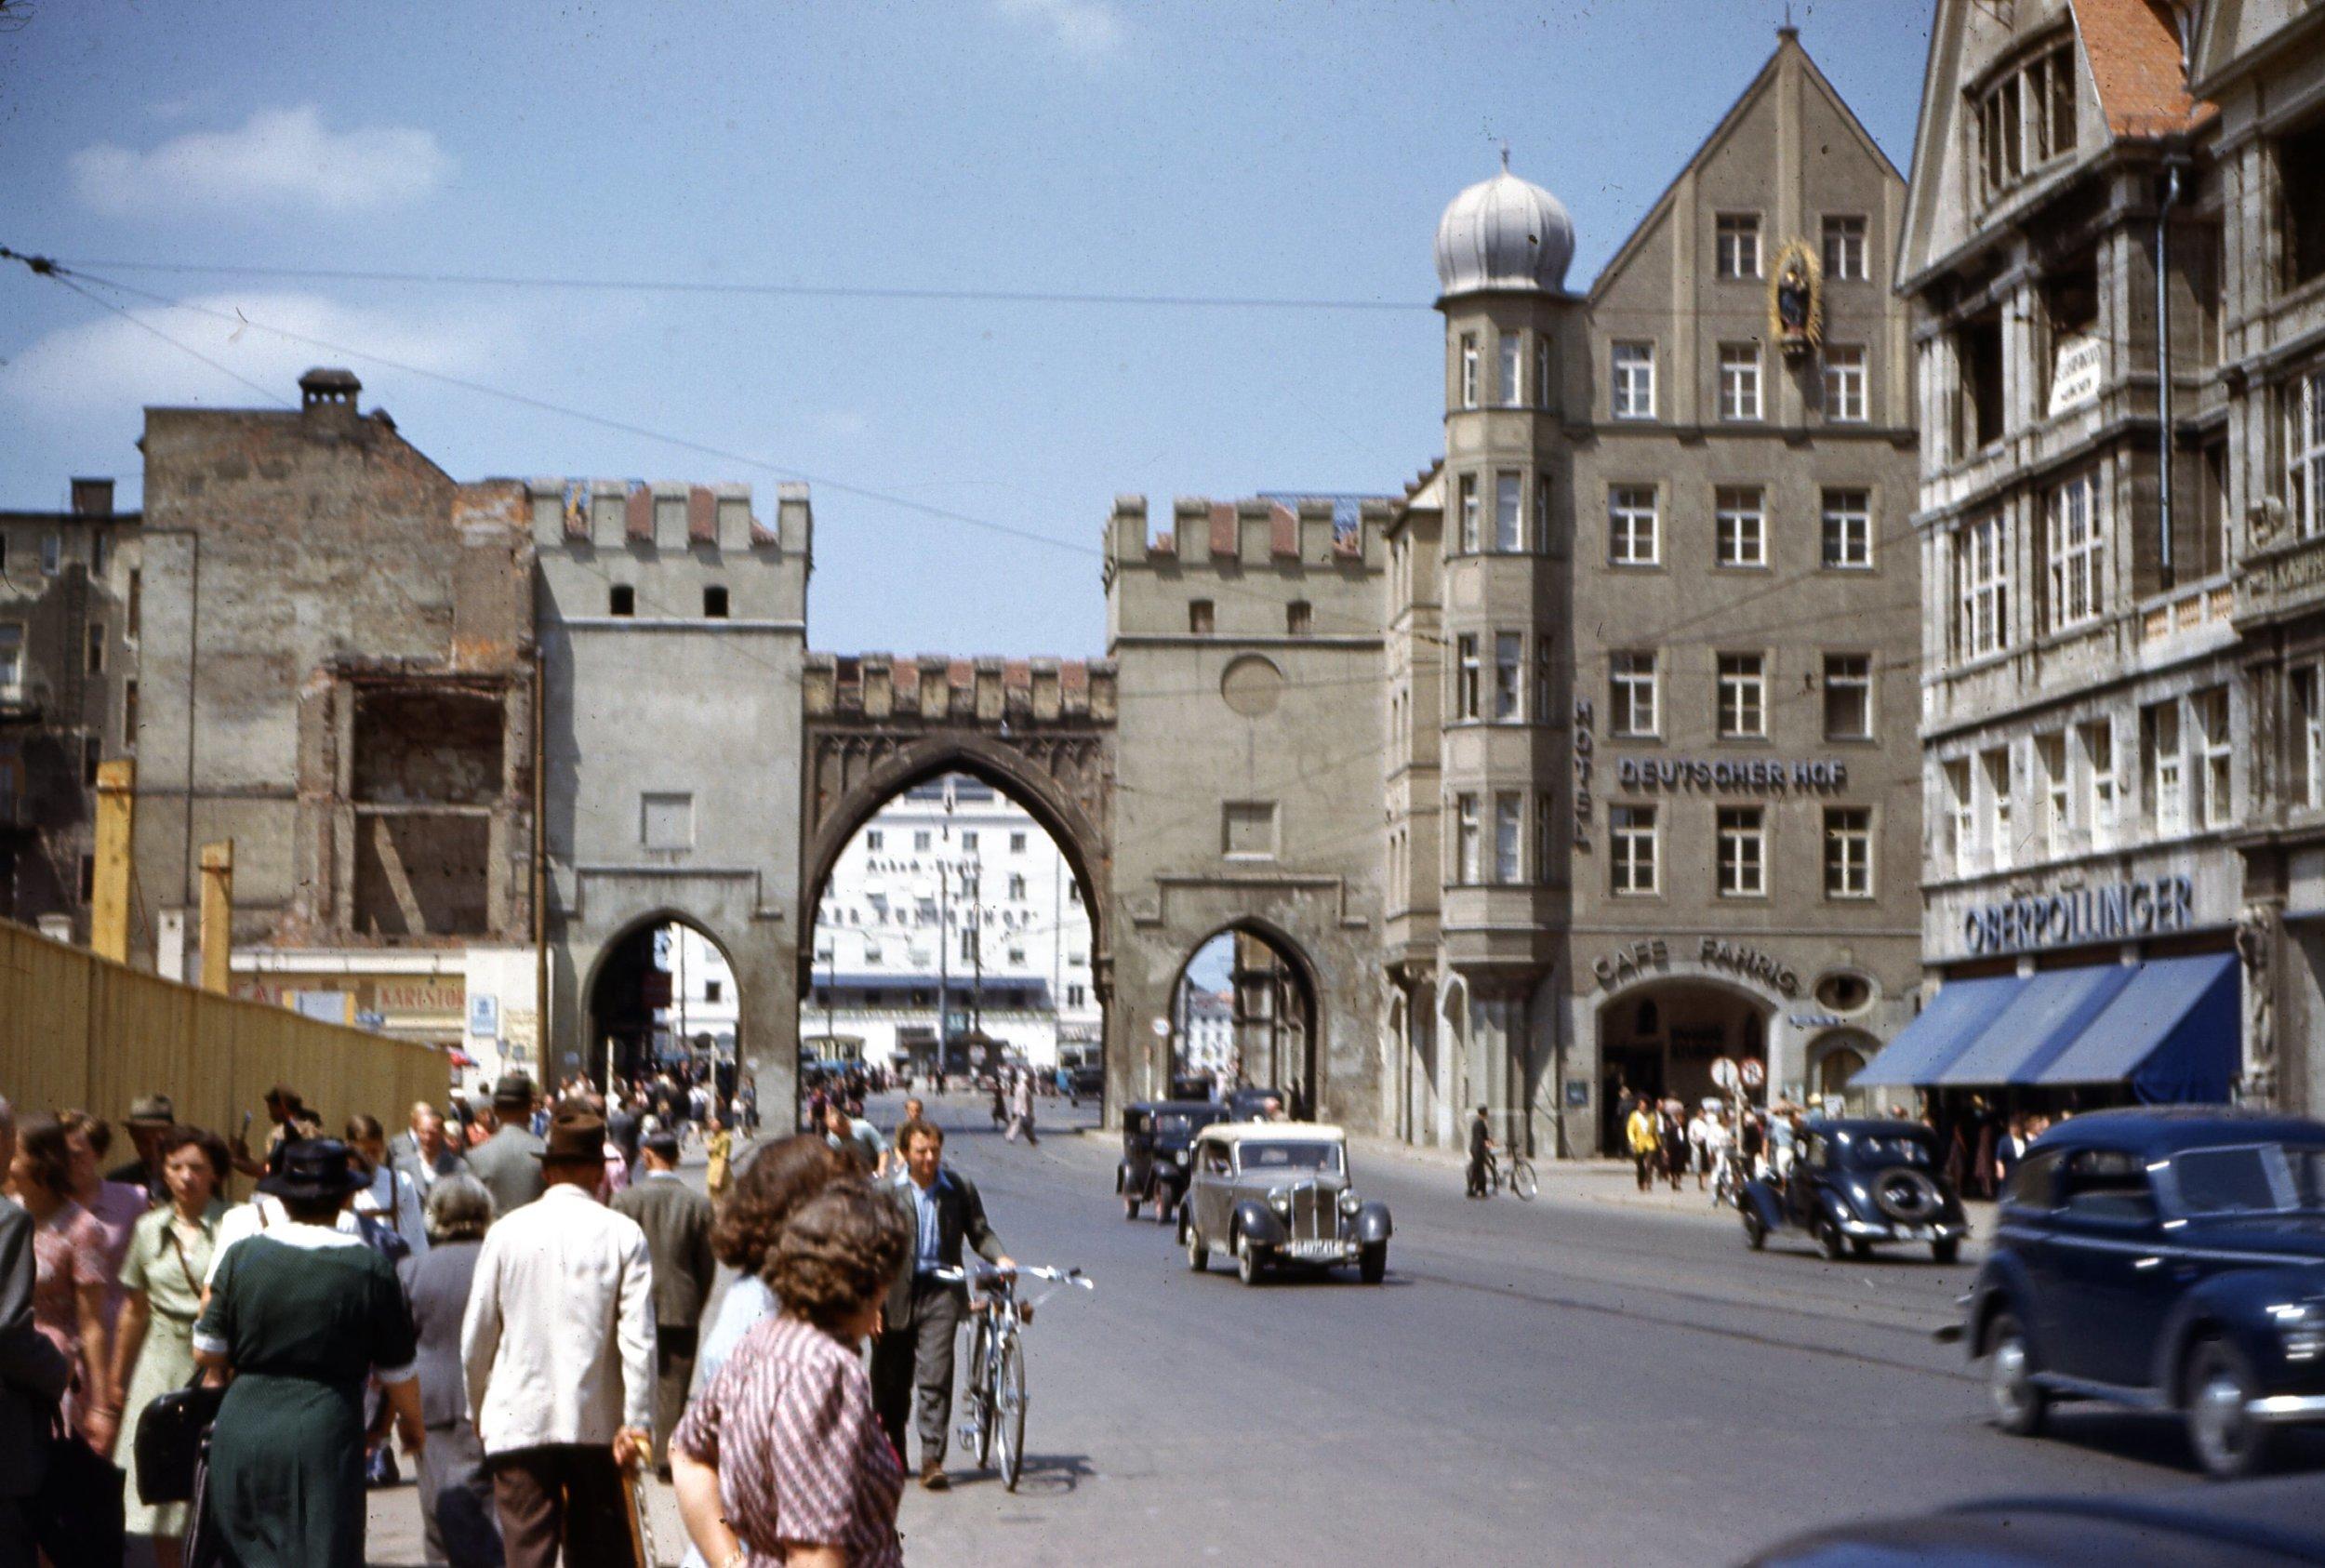 Karlstor_Old_City_Gate.jpg